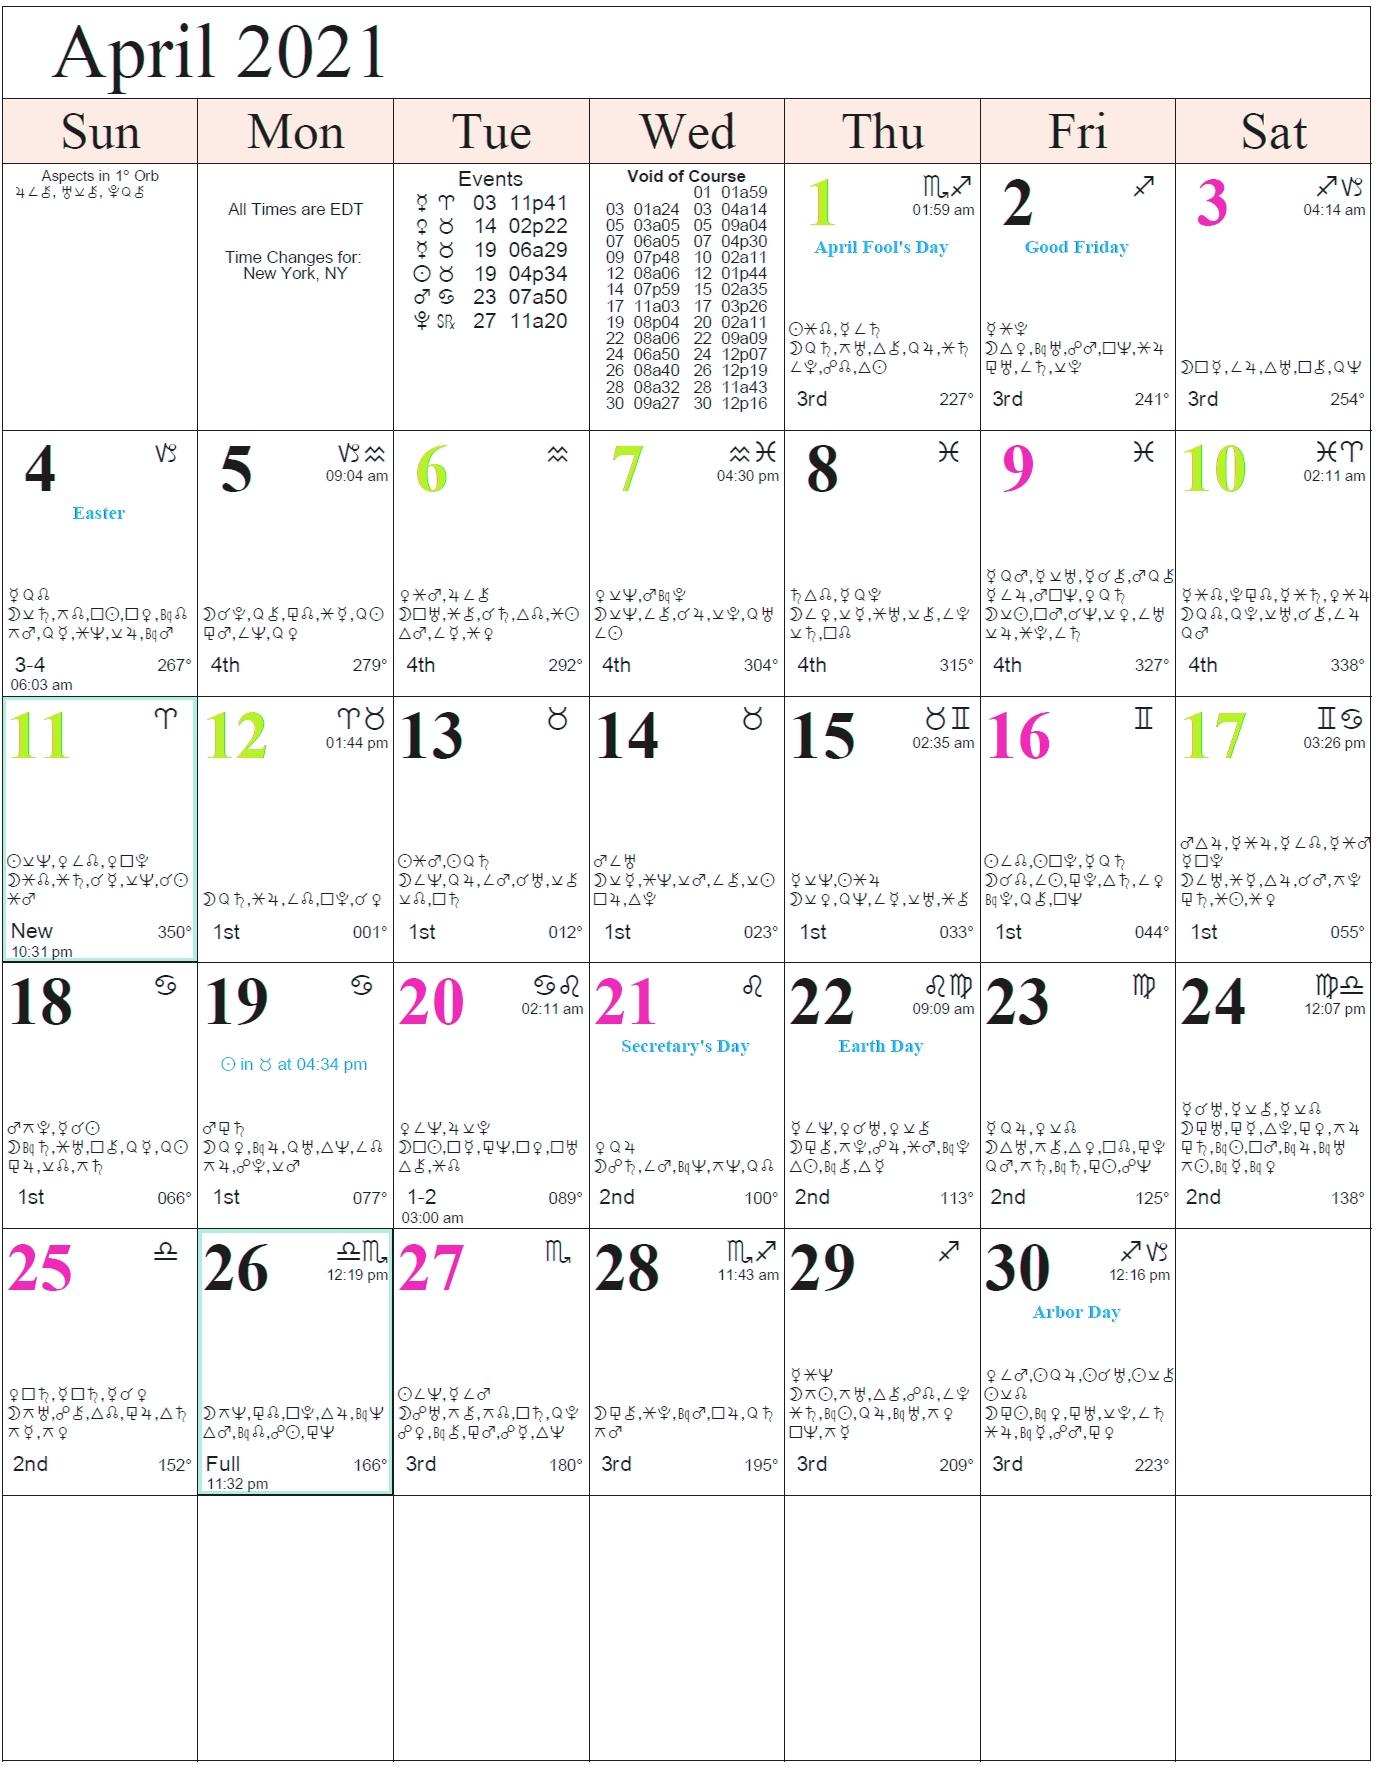 Monthly Astrology Calendars  Solar Calendar 2021